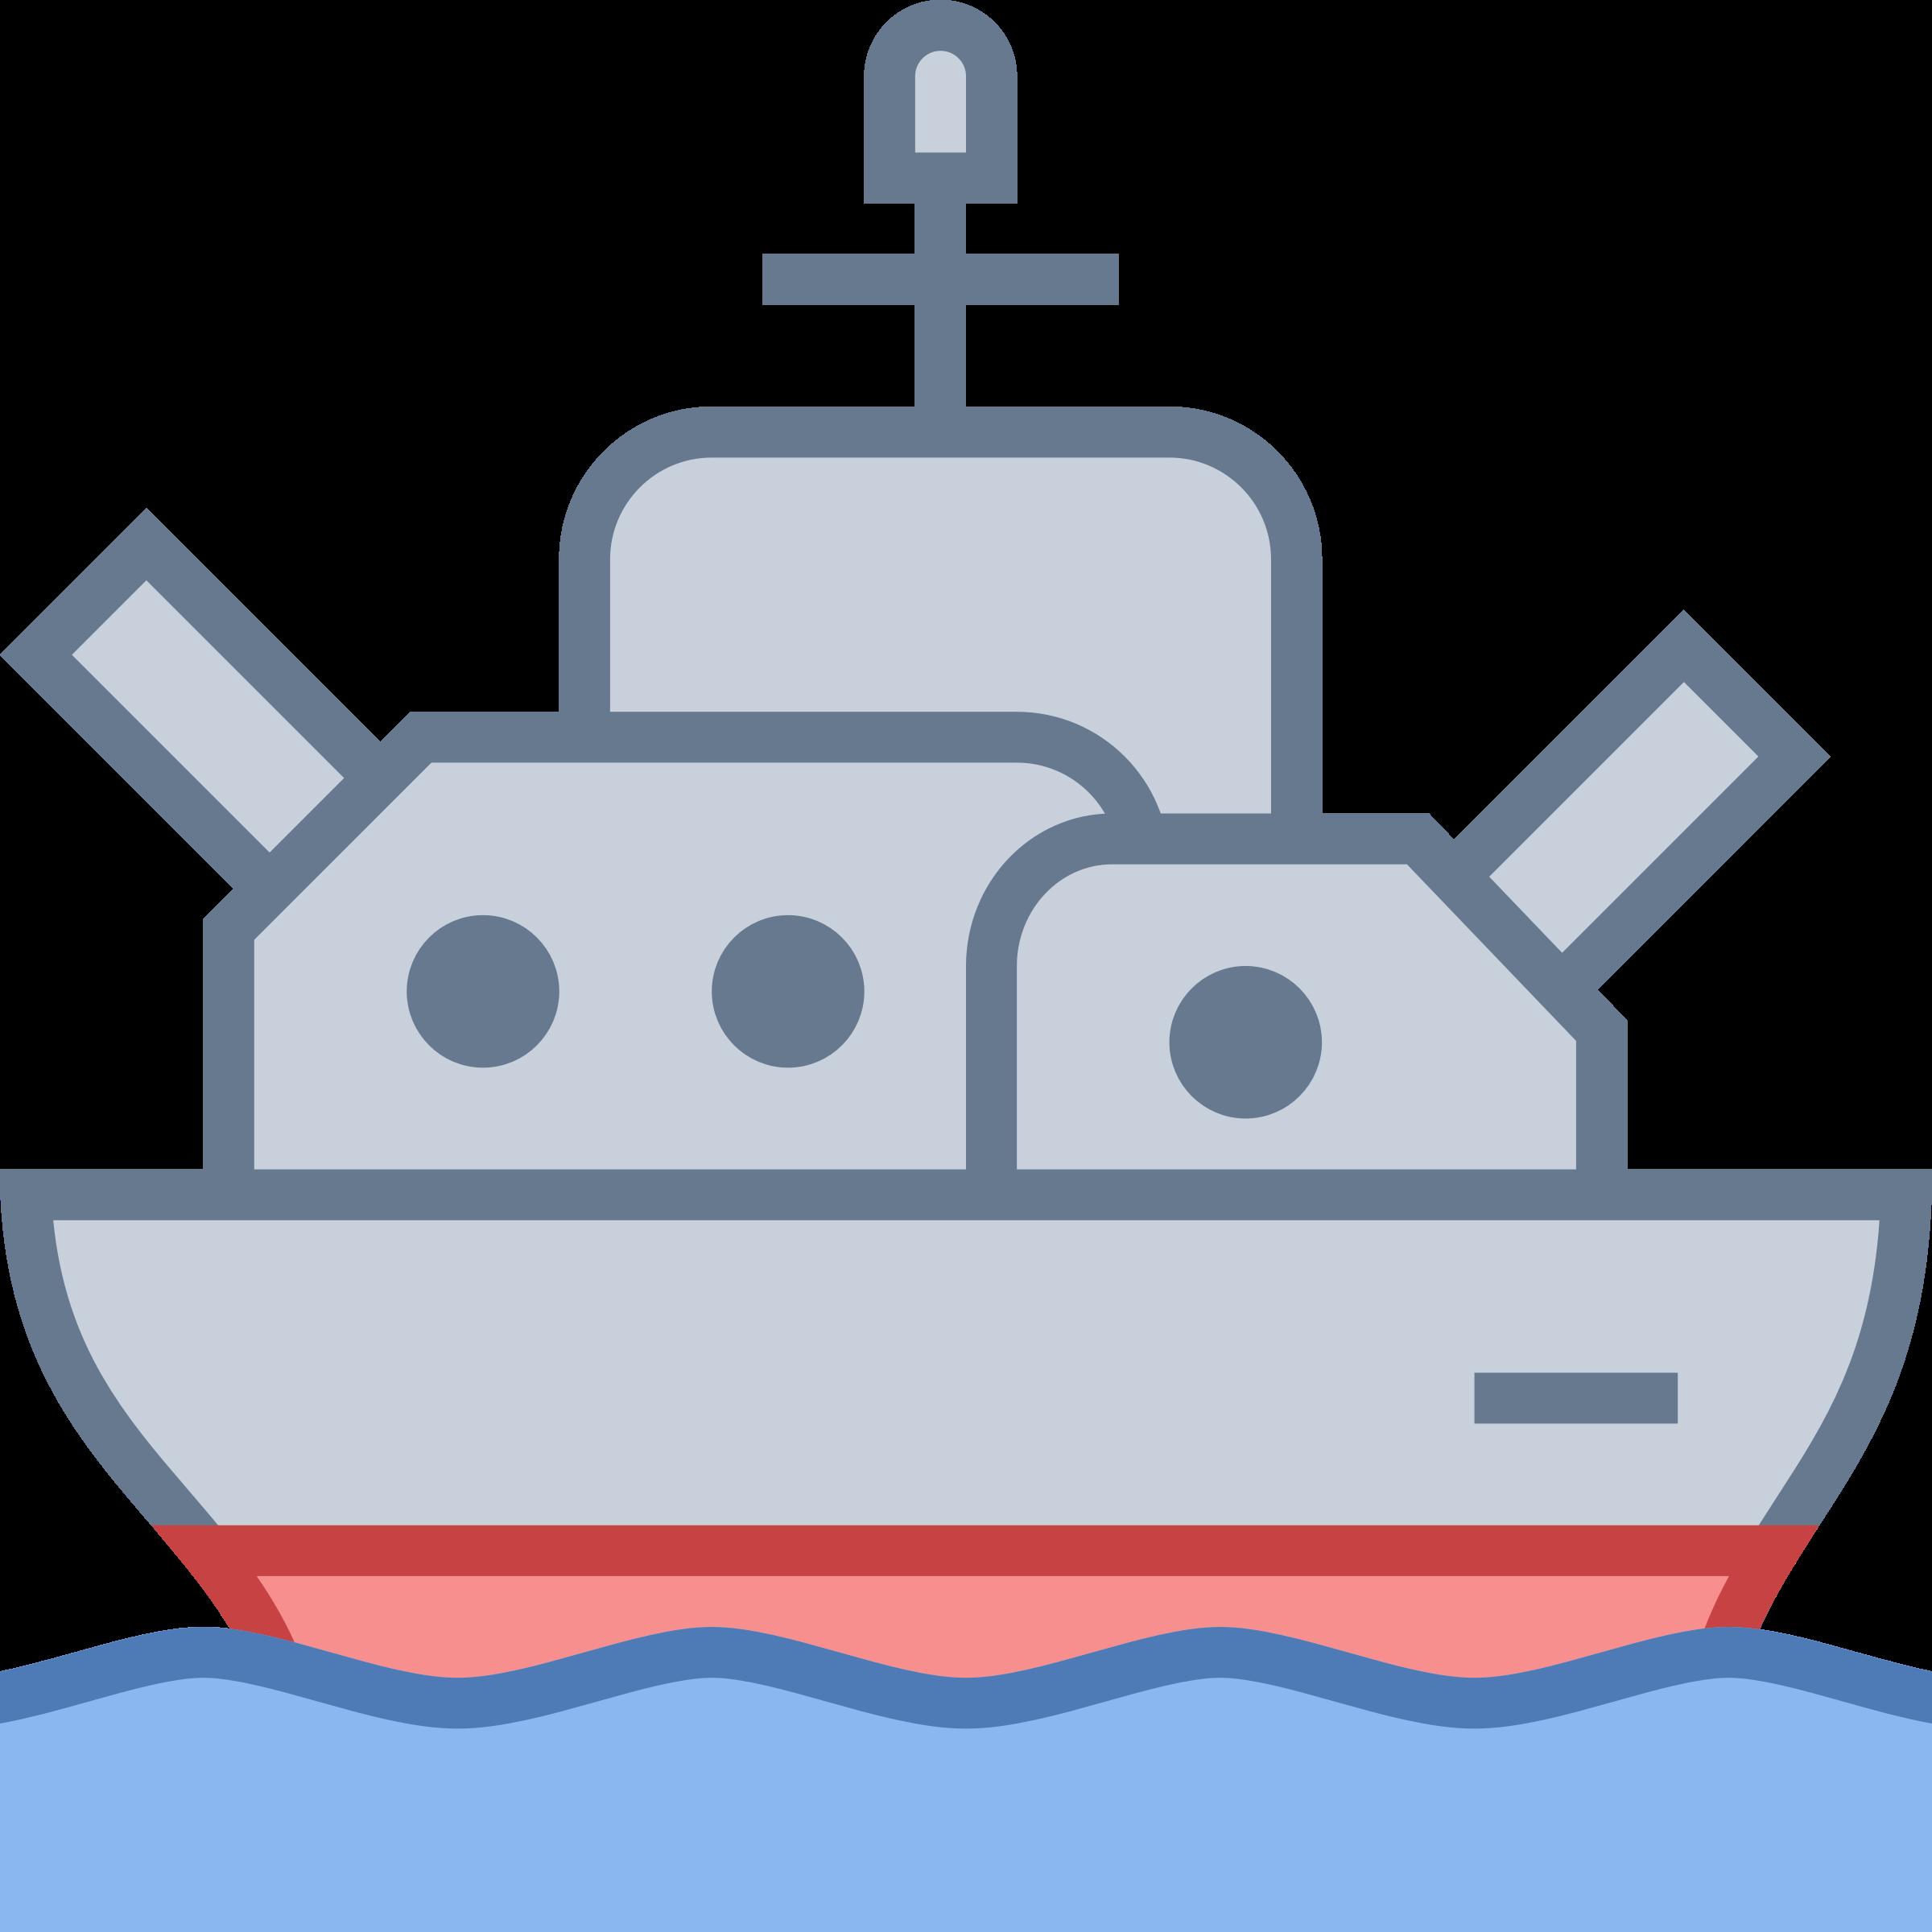 banner royalty free Big image png. Battleship clipart.